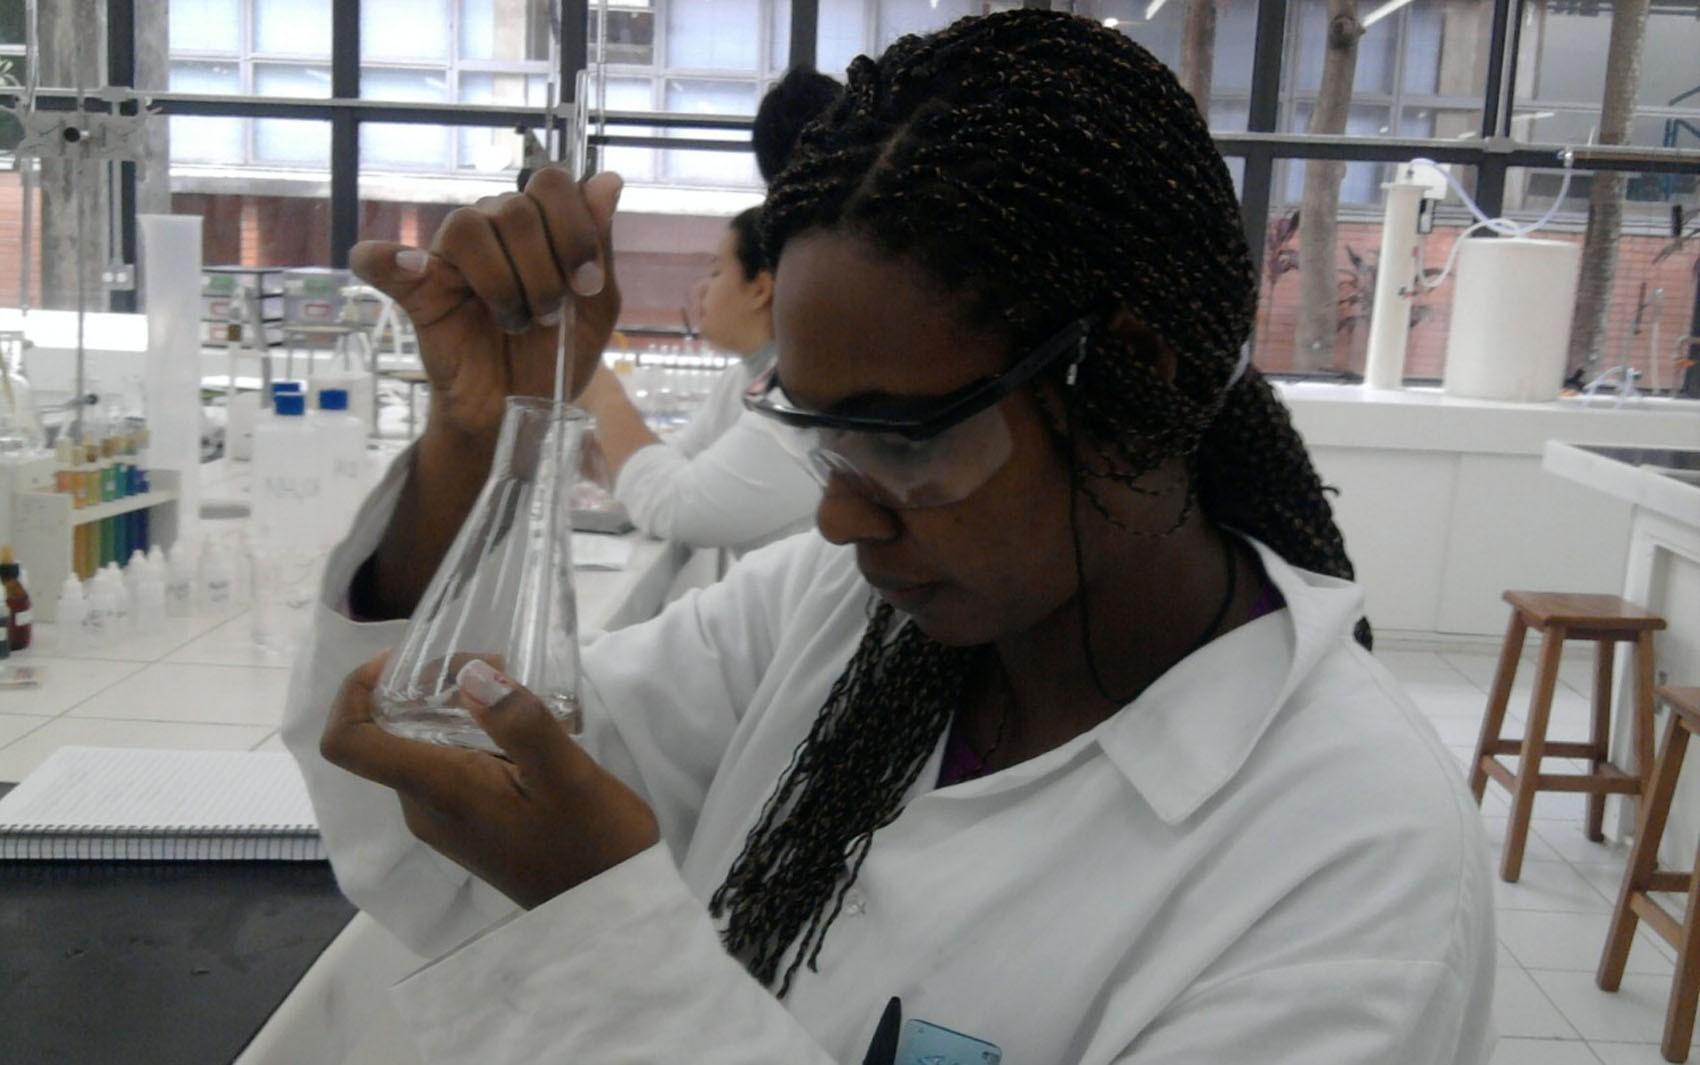 Unicamp 2019: estudante do último ano de Química na USP tranca curso para seguir sonho da Medicina